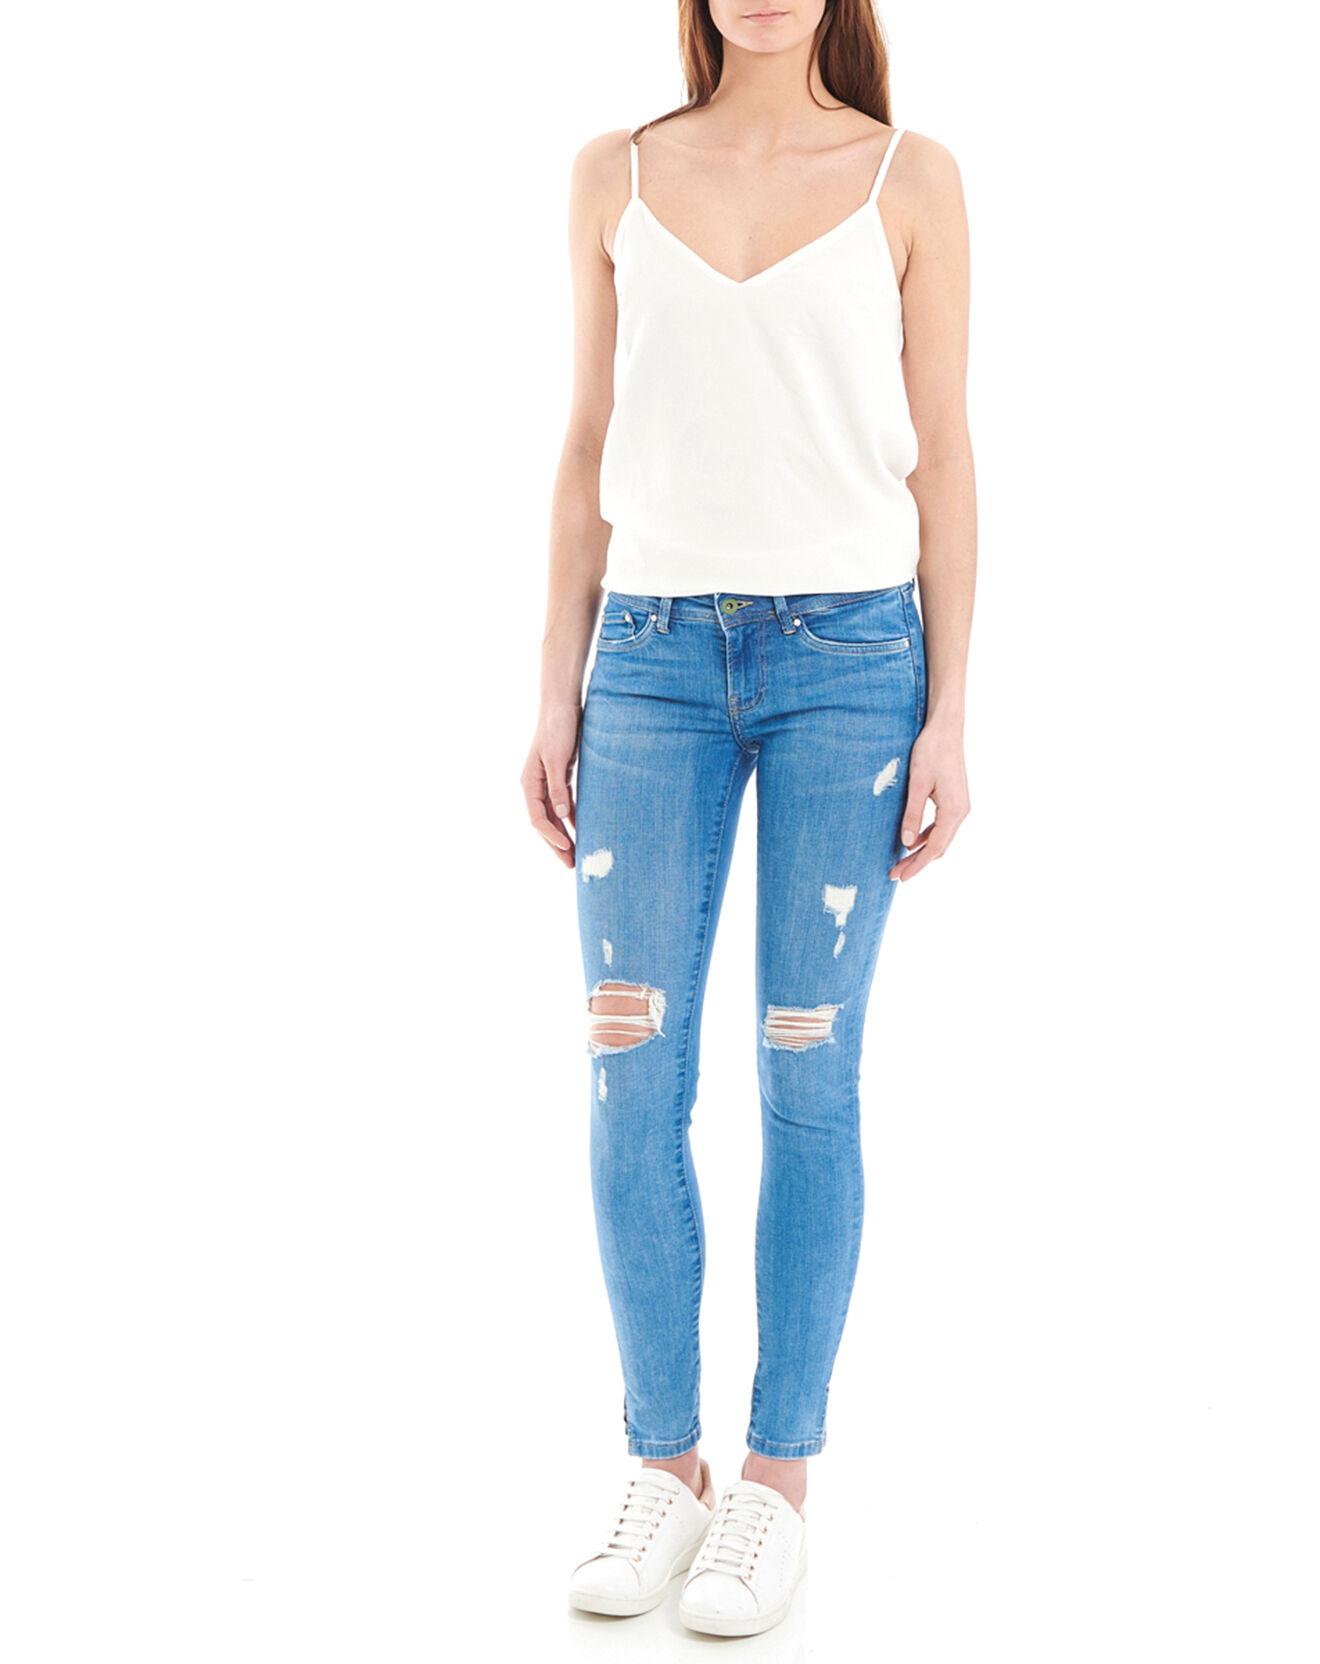 Jean skinny Pixie Destroy Eco bleu - Pepe Jeans - Modalova